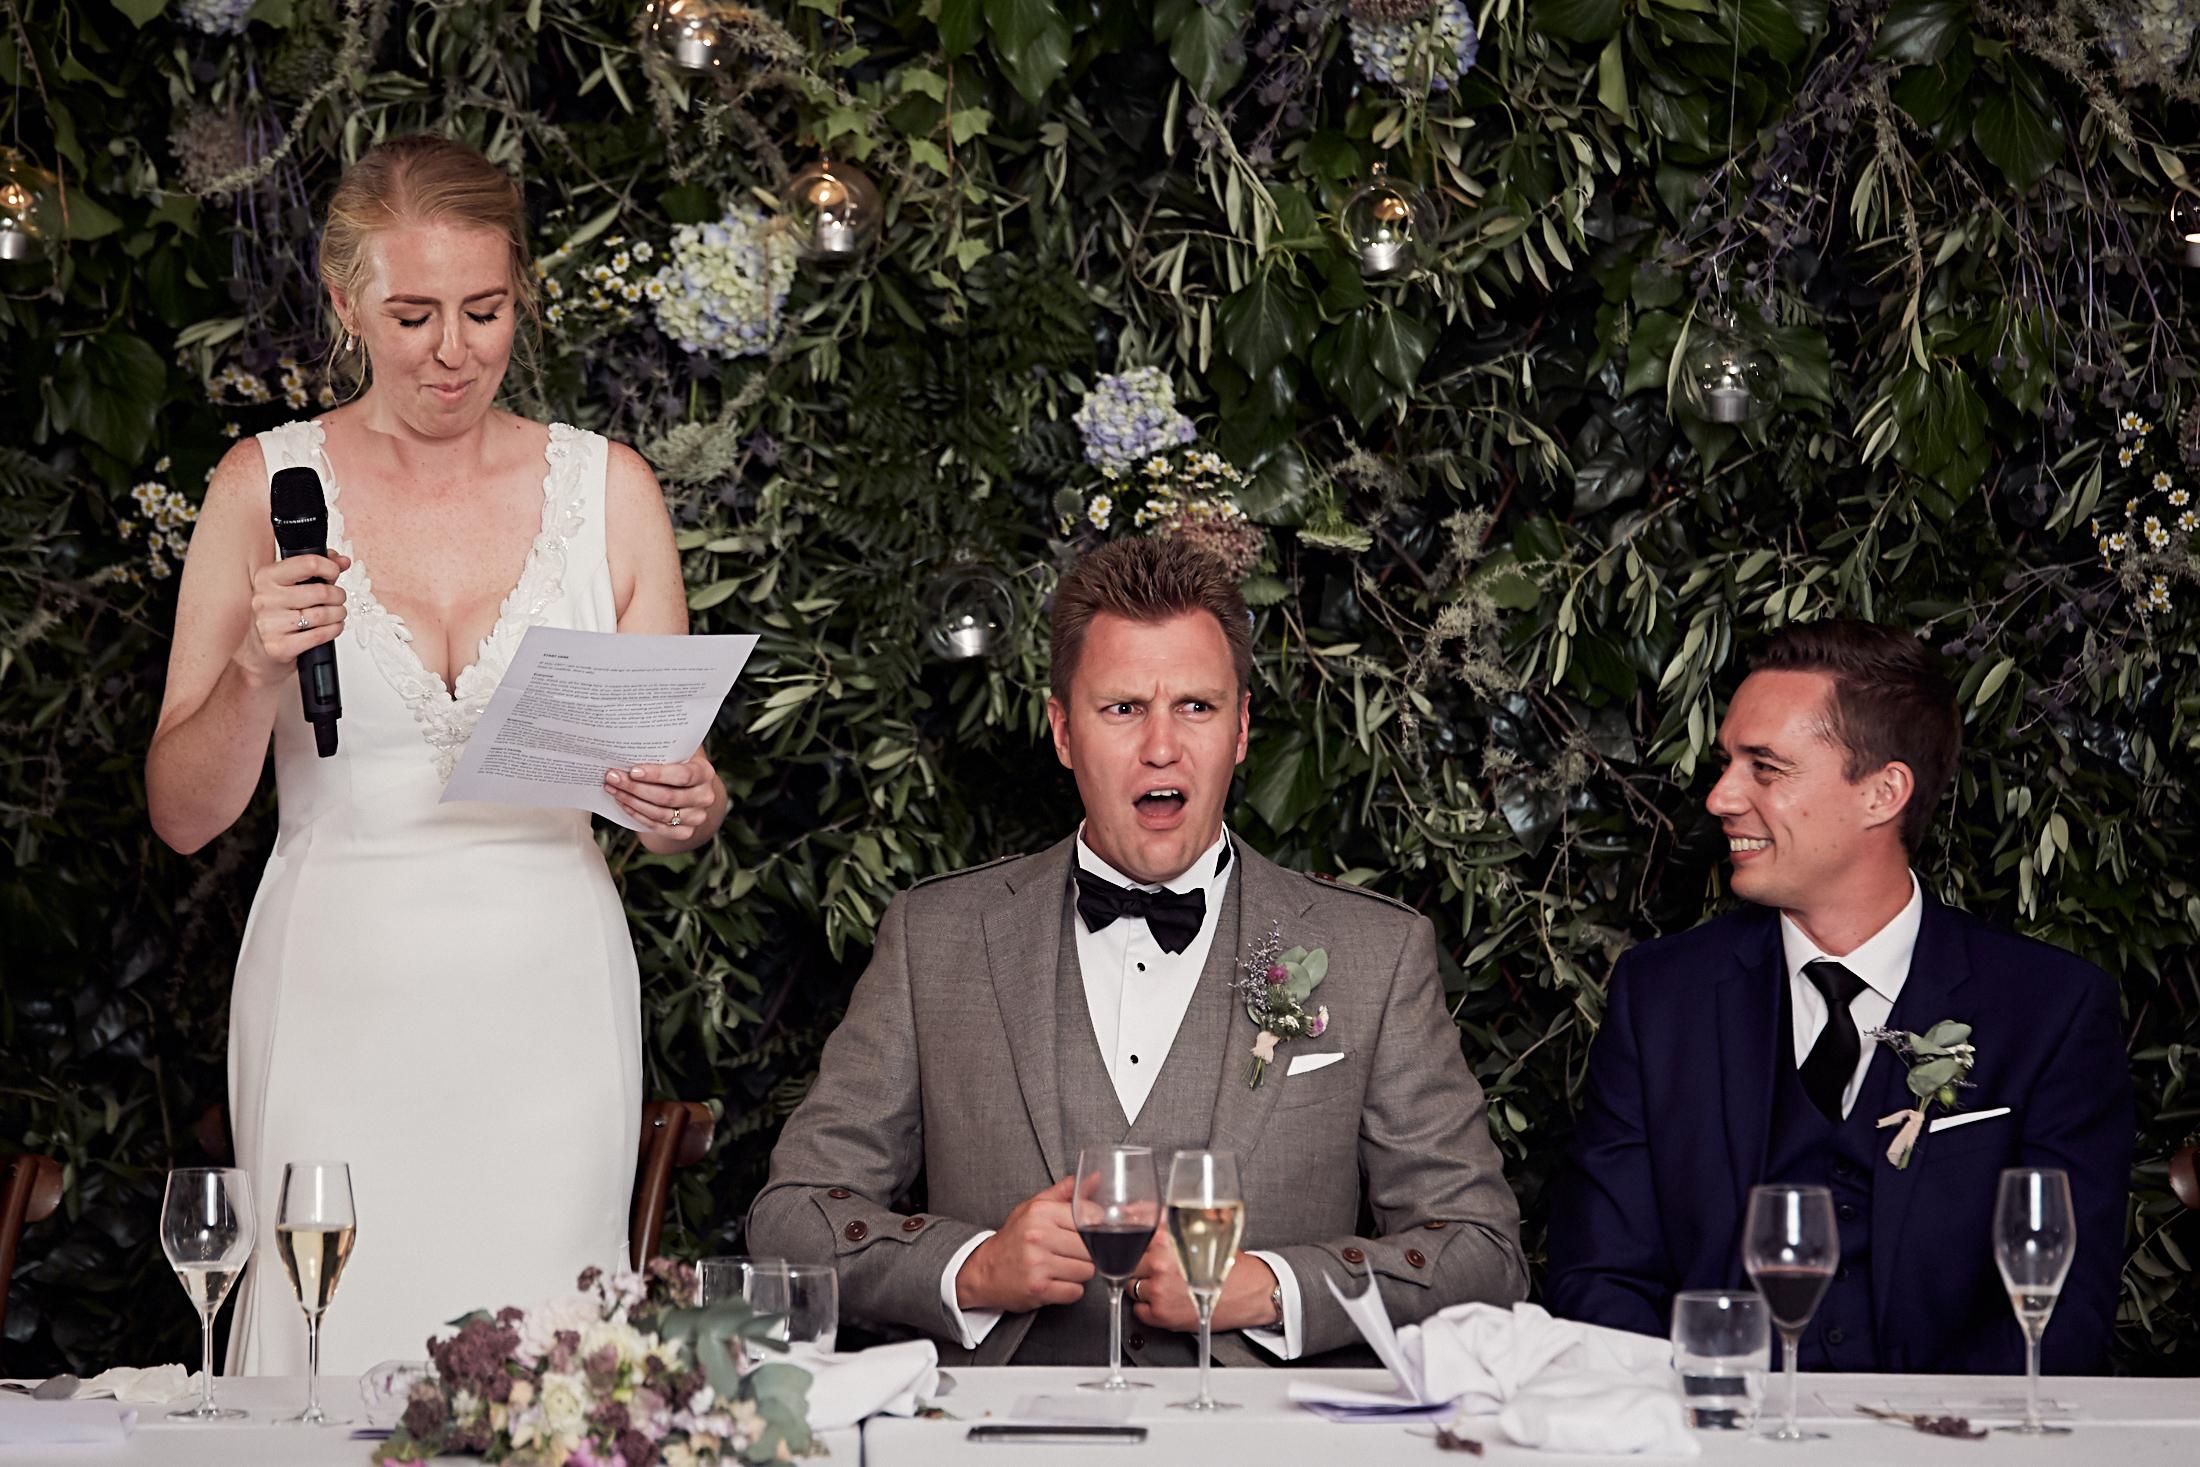 Classic wedding moment